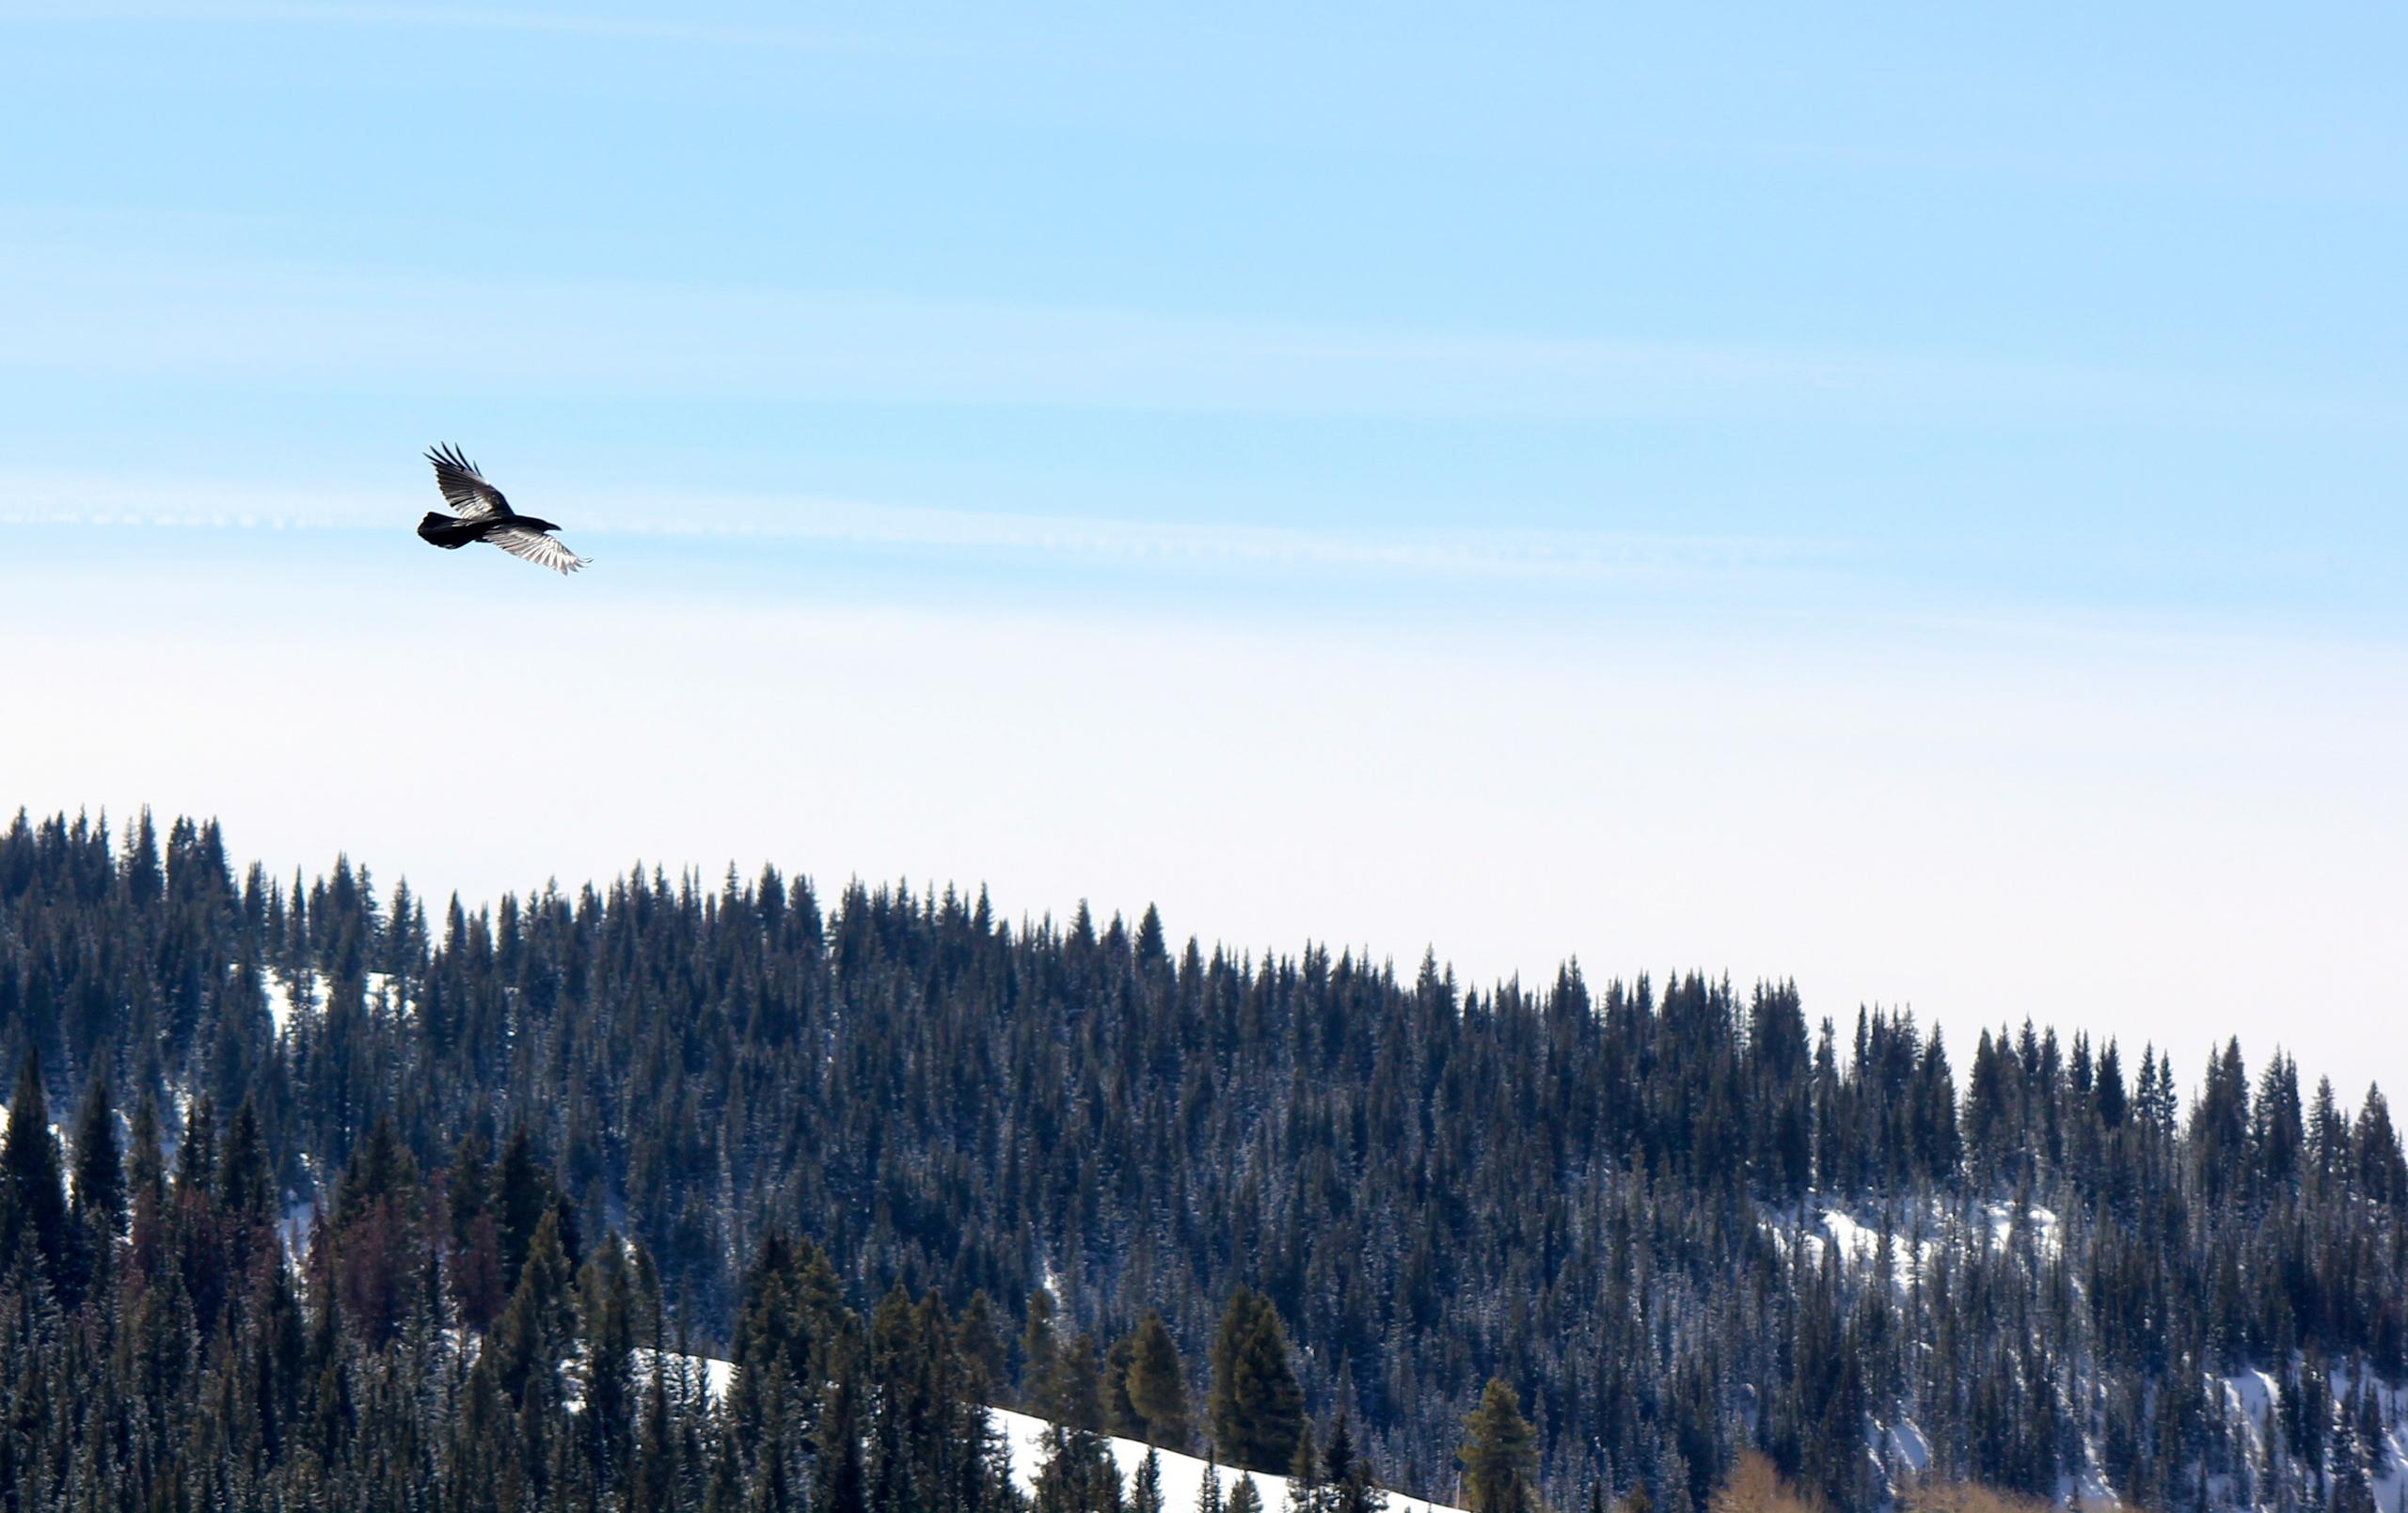 Wildlife fotografi gambar Raven flying over Vail Colorado HD 2560x1609